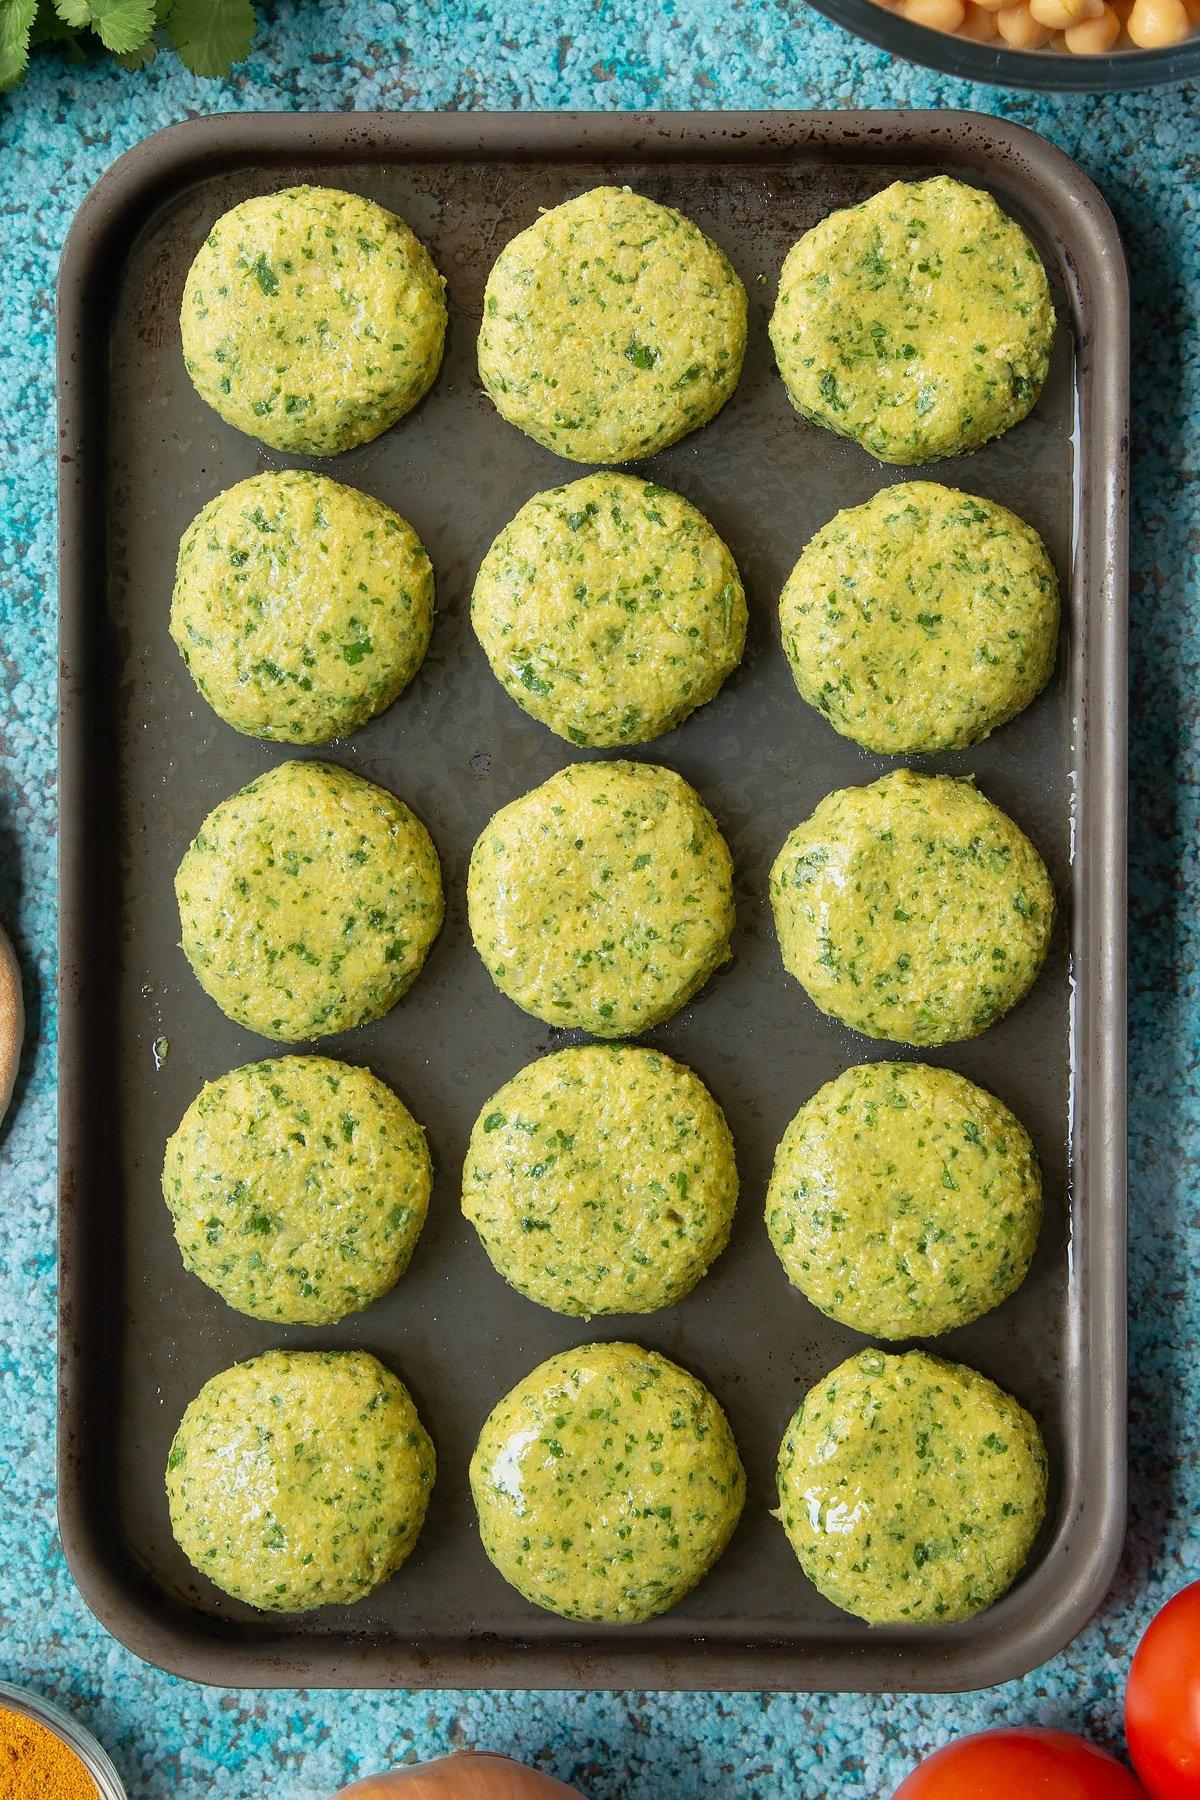 Oiled, raw gluten-free falafel on a baking tray.